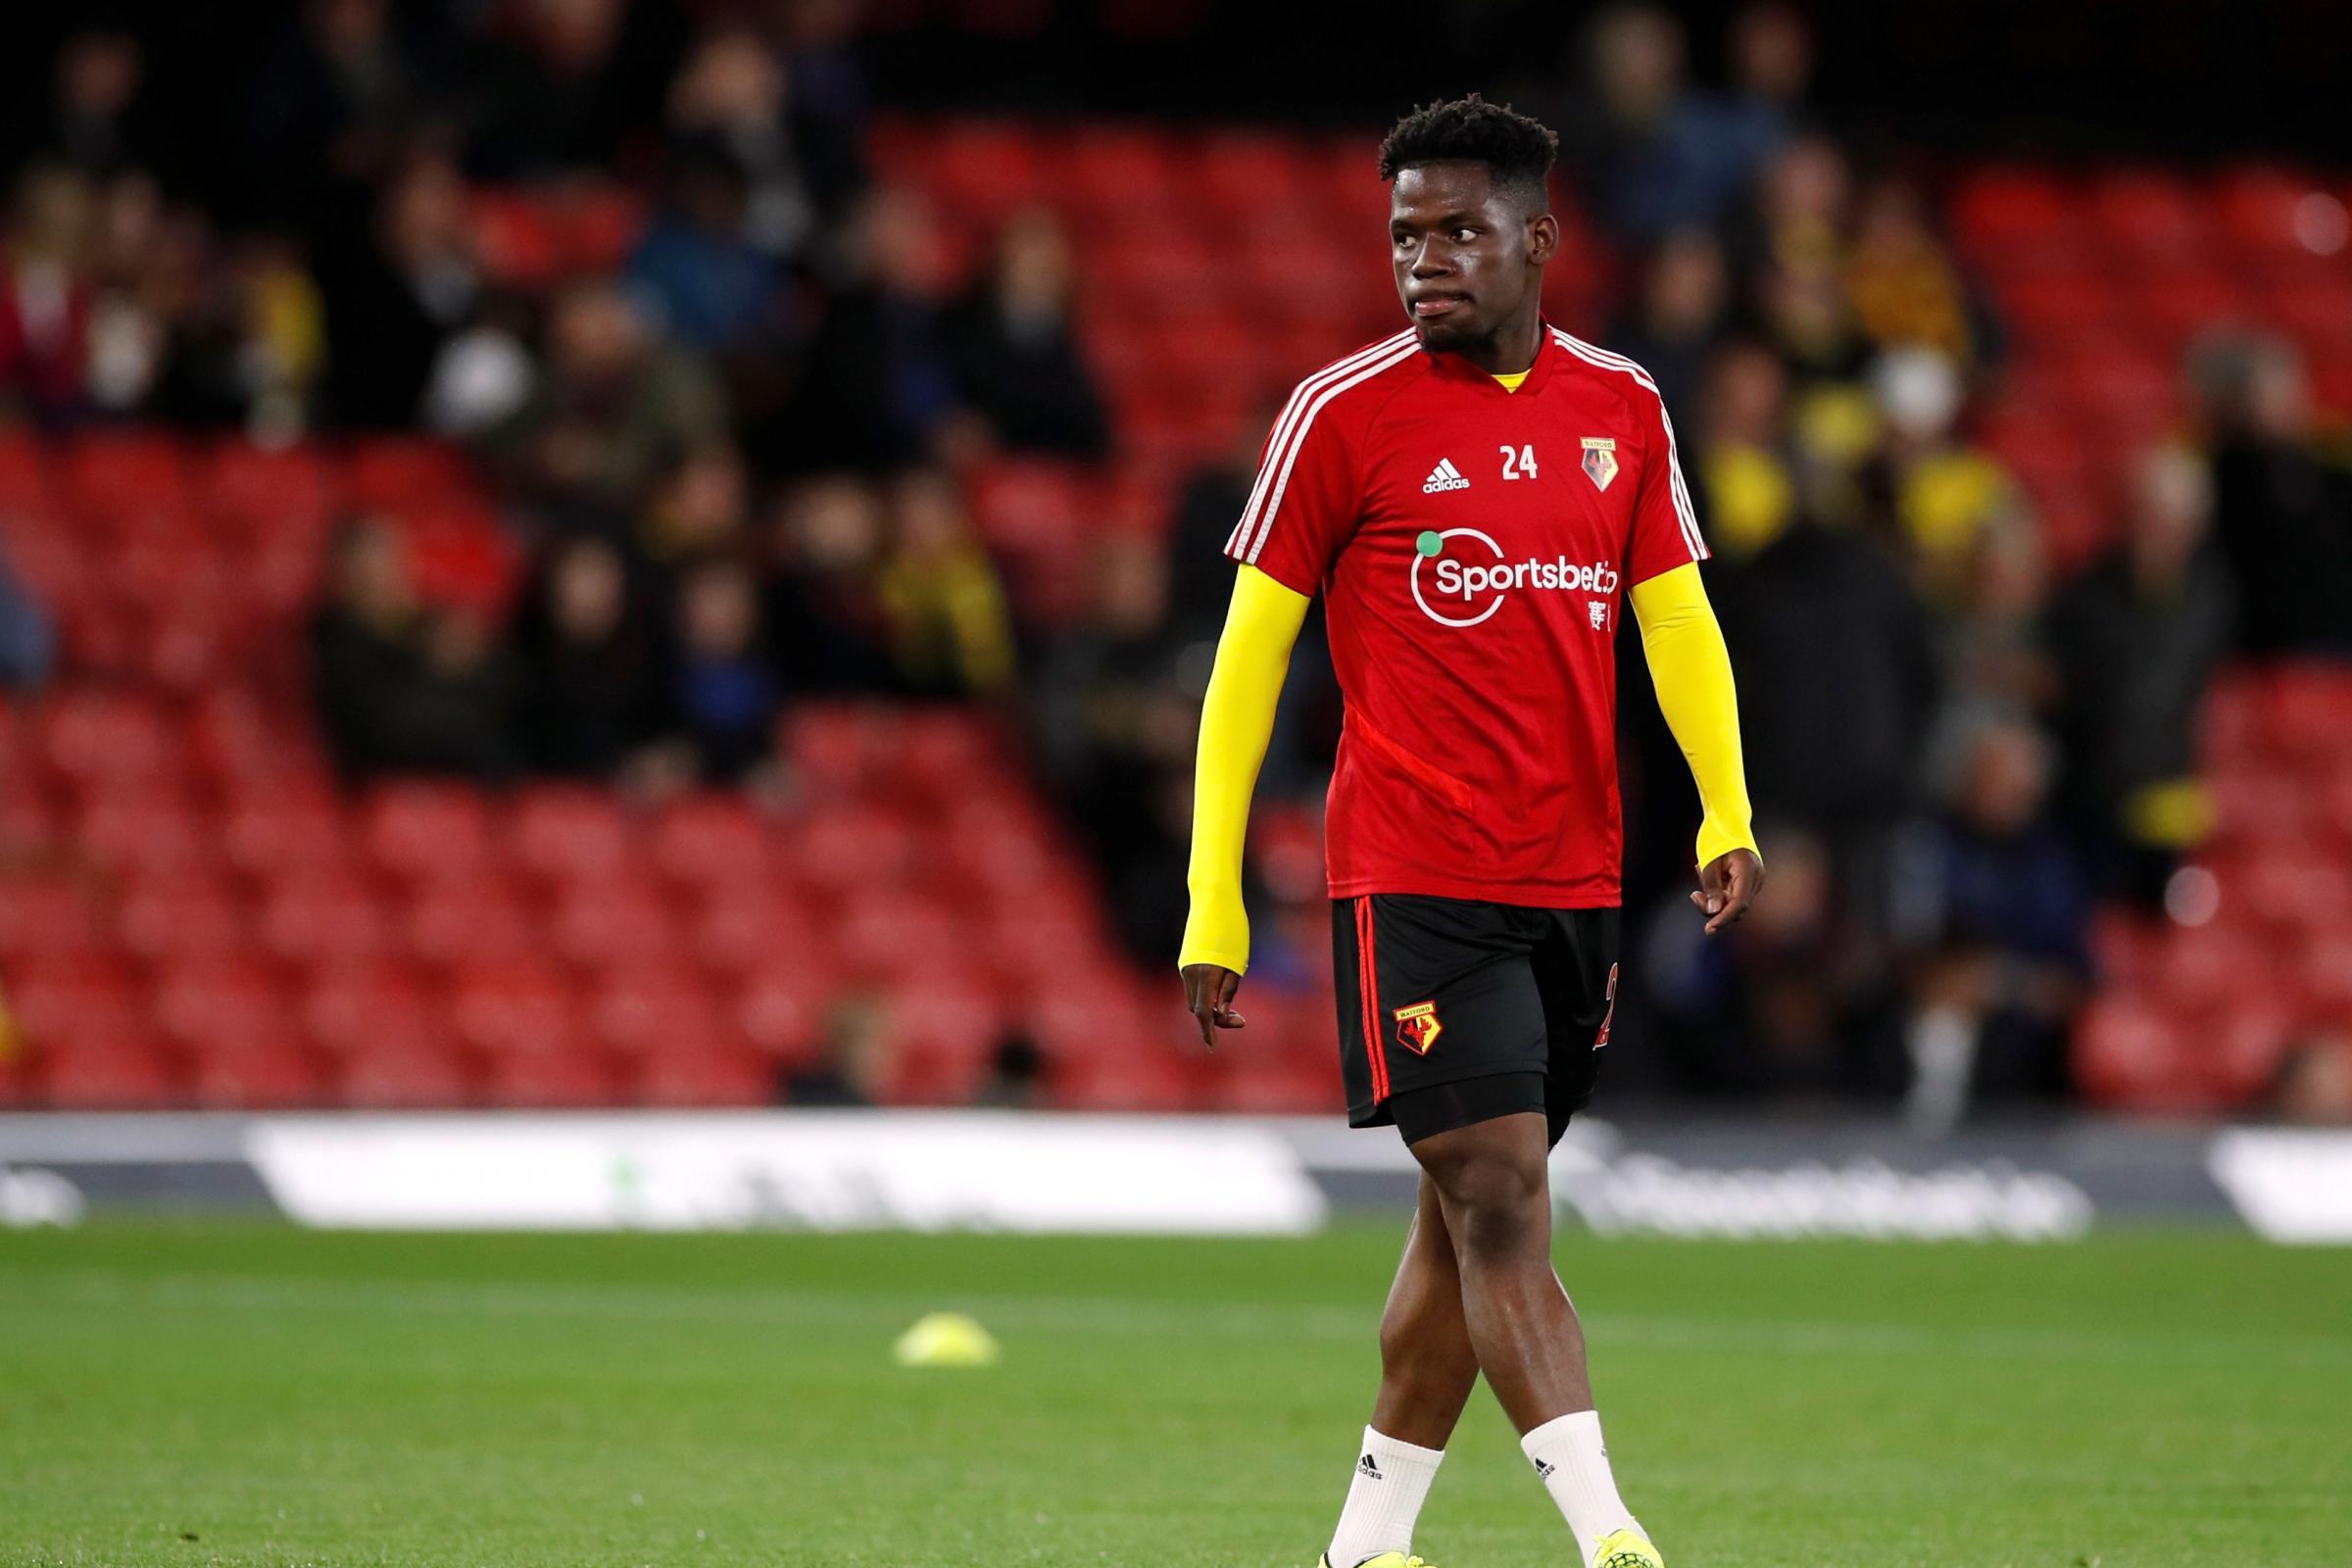 Watford's Tom Dele-Bashiru has his heart set on representing Nigeria at the Olympics